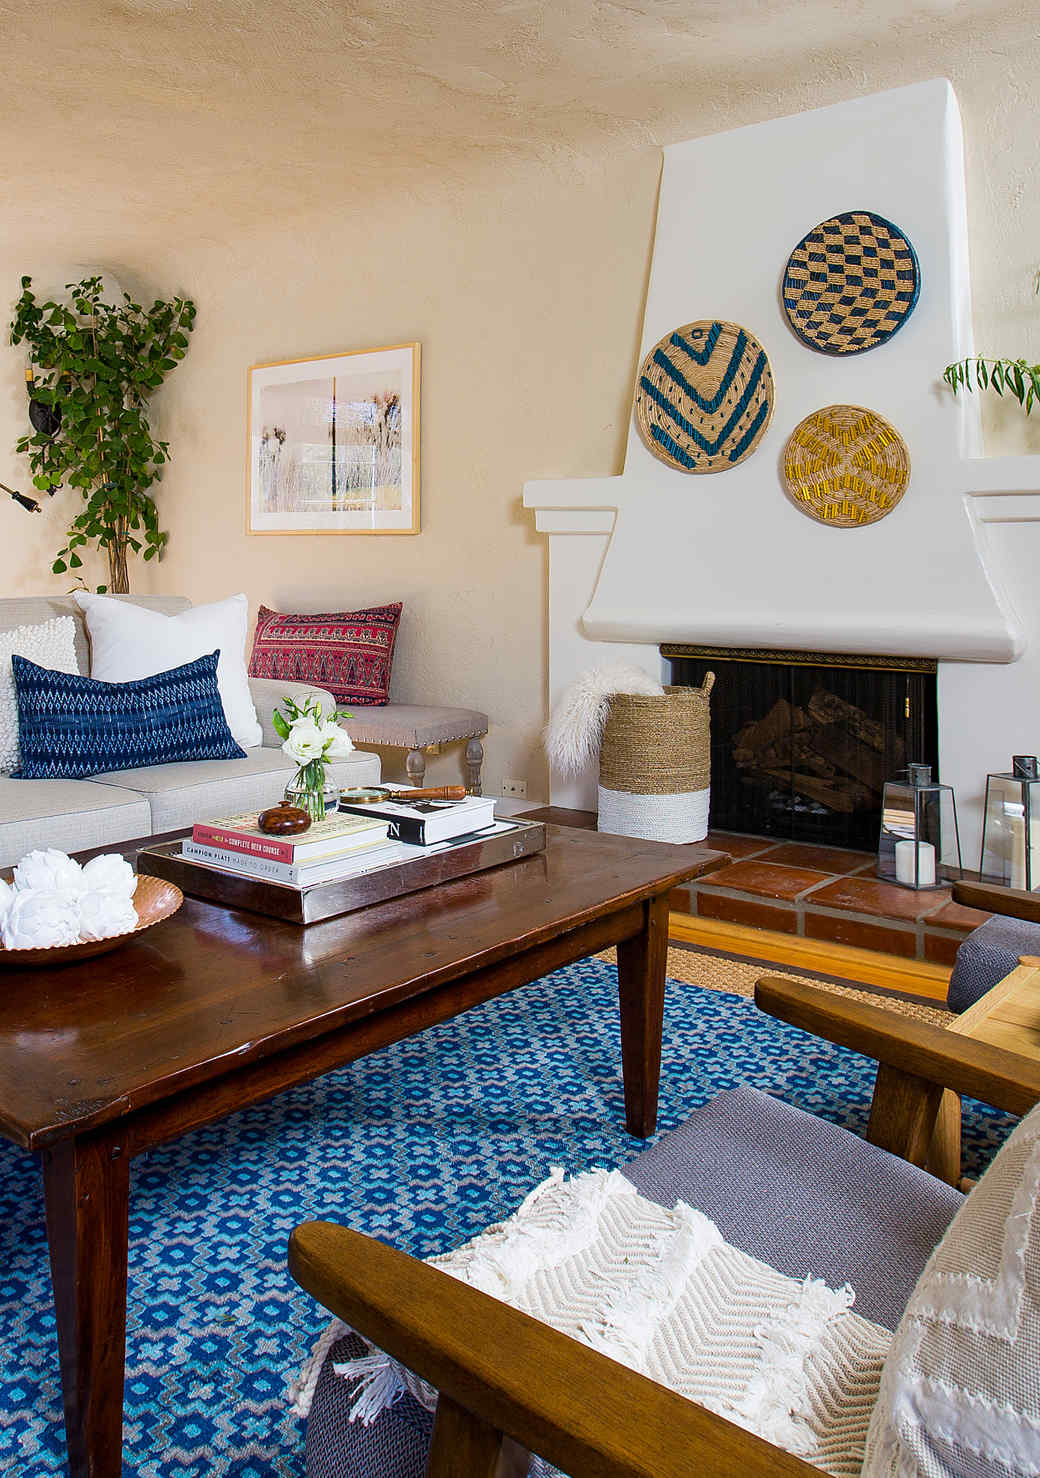 living room woven plate mantel display blue rug